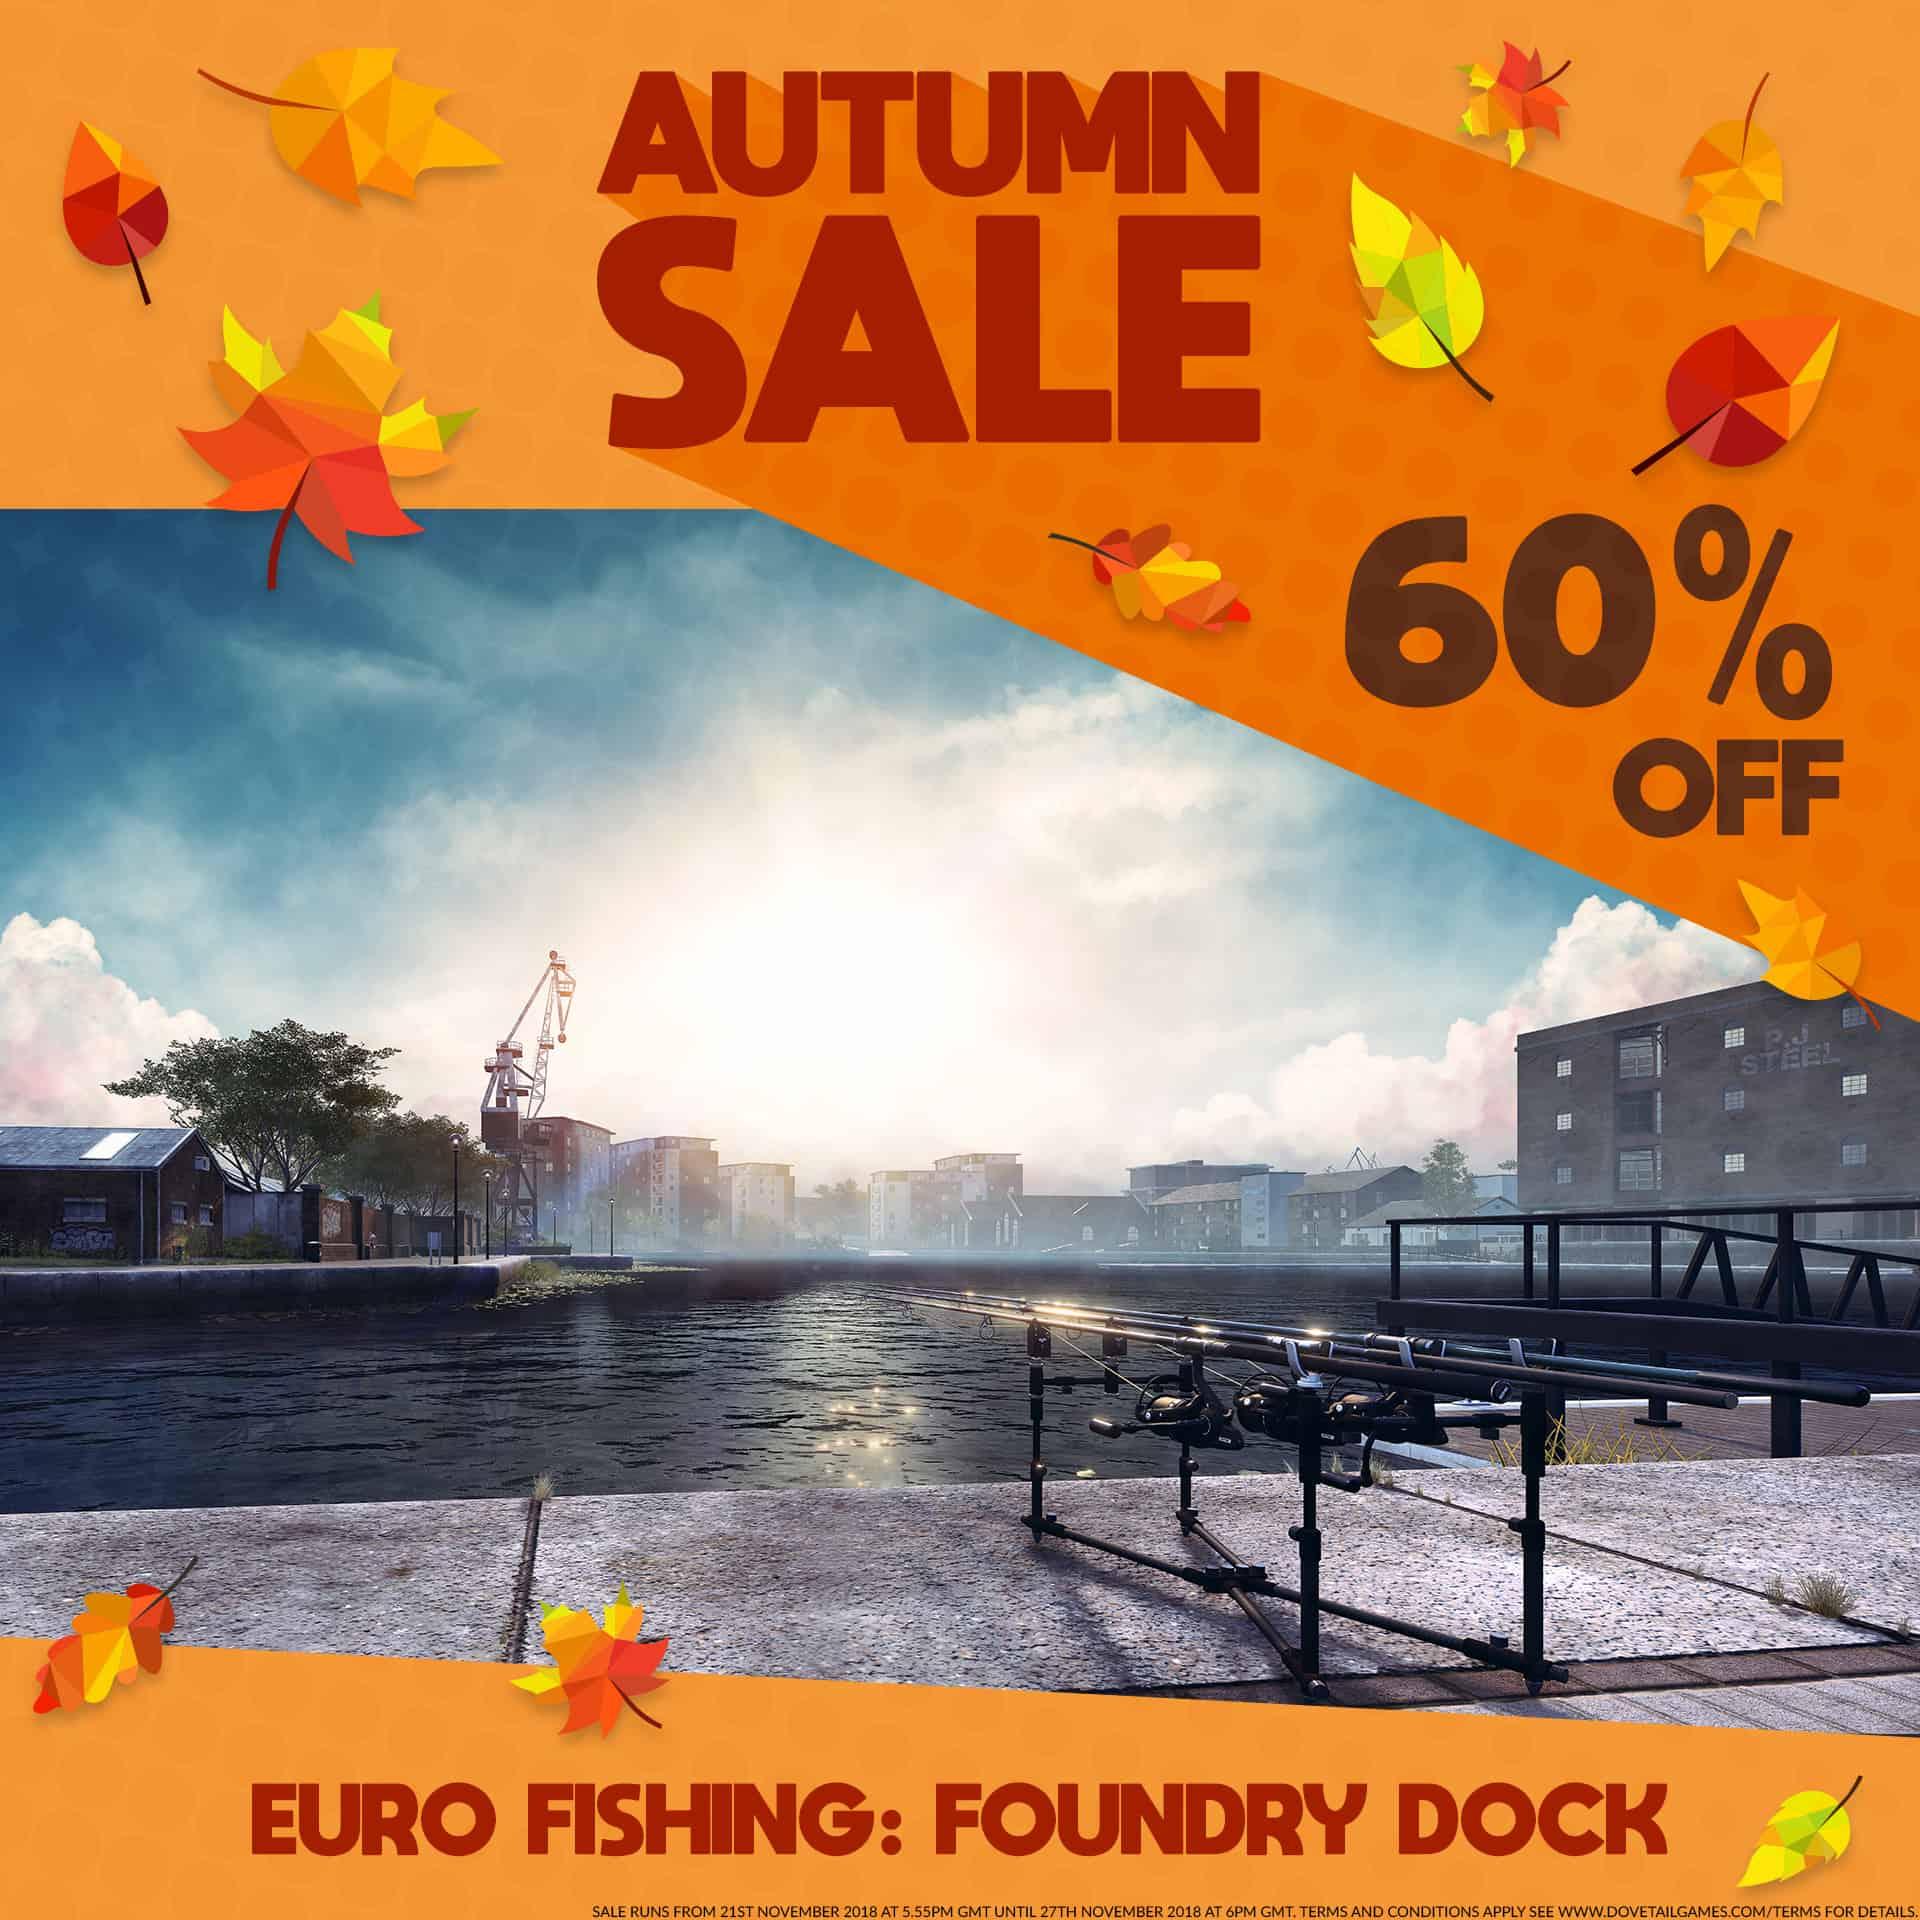 AutumnSale_Products_FoundryDock